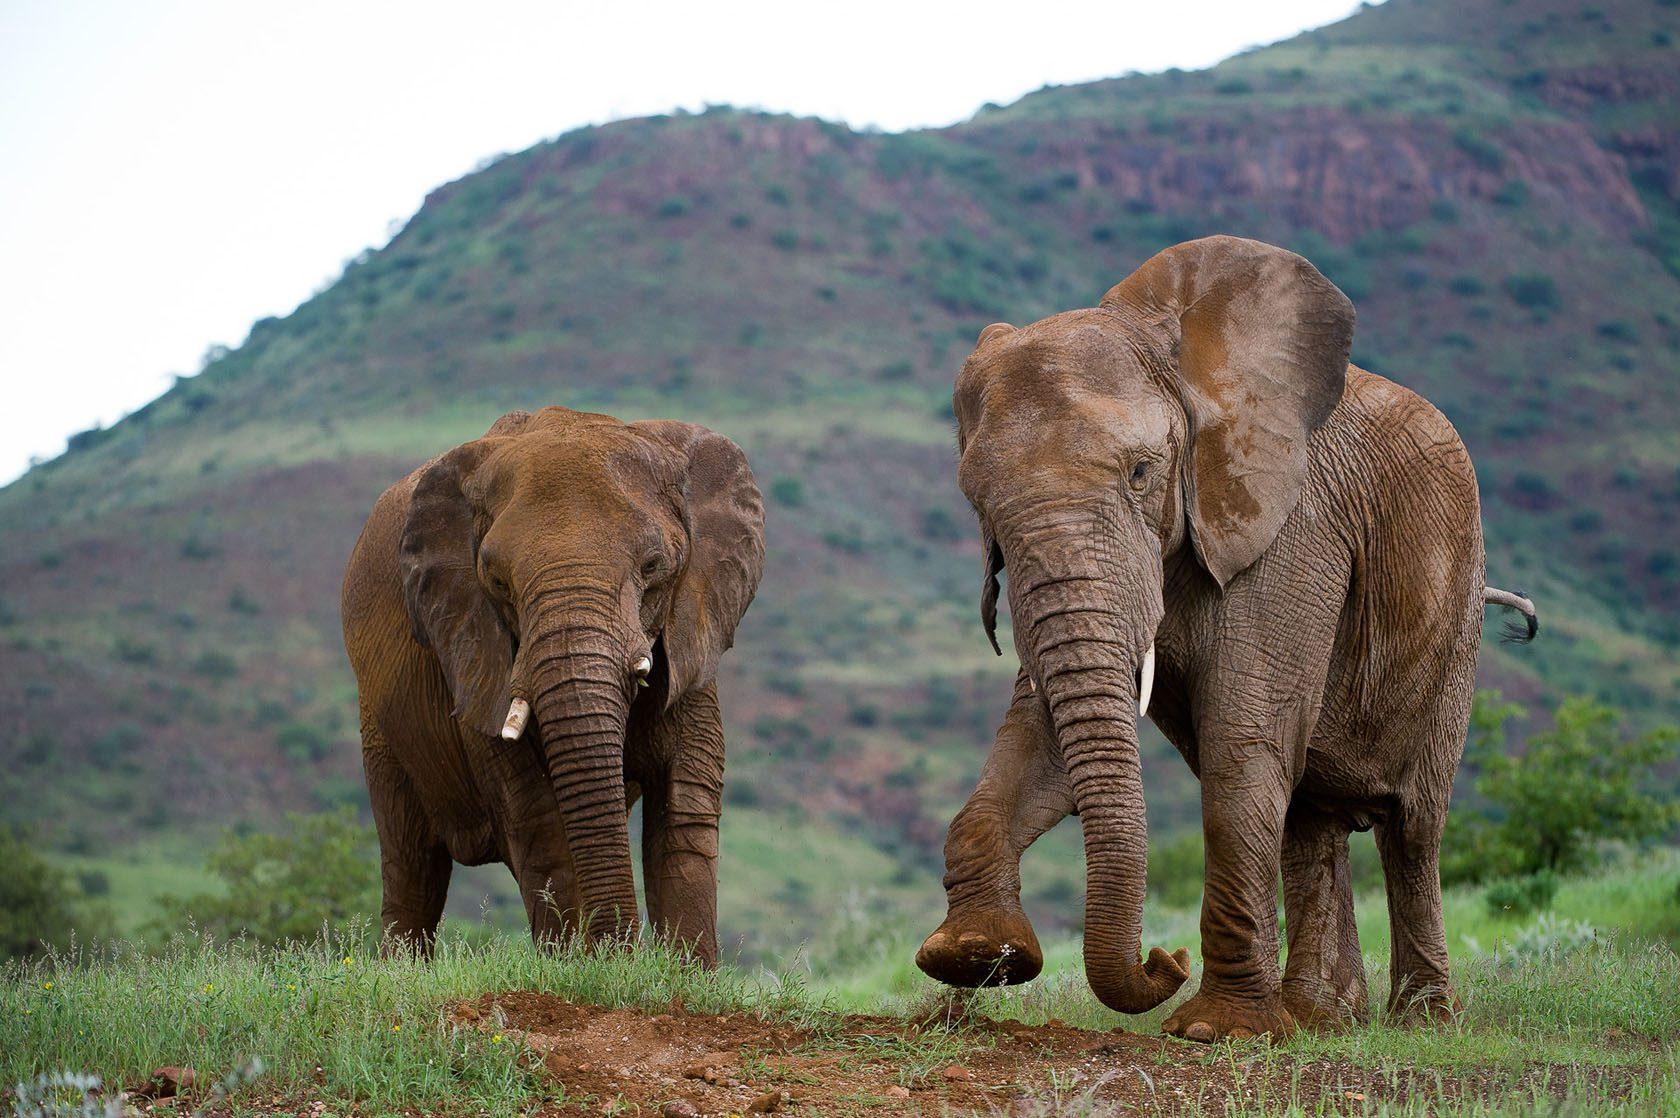 Elephants in Damaraland